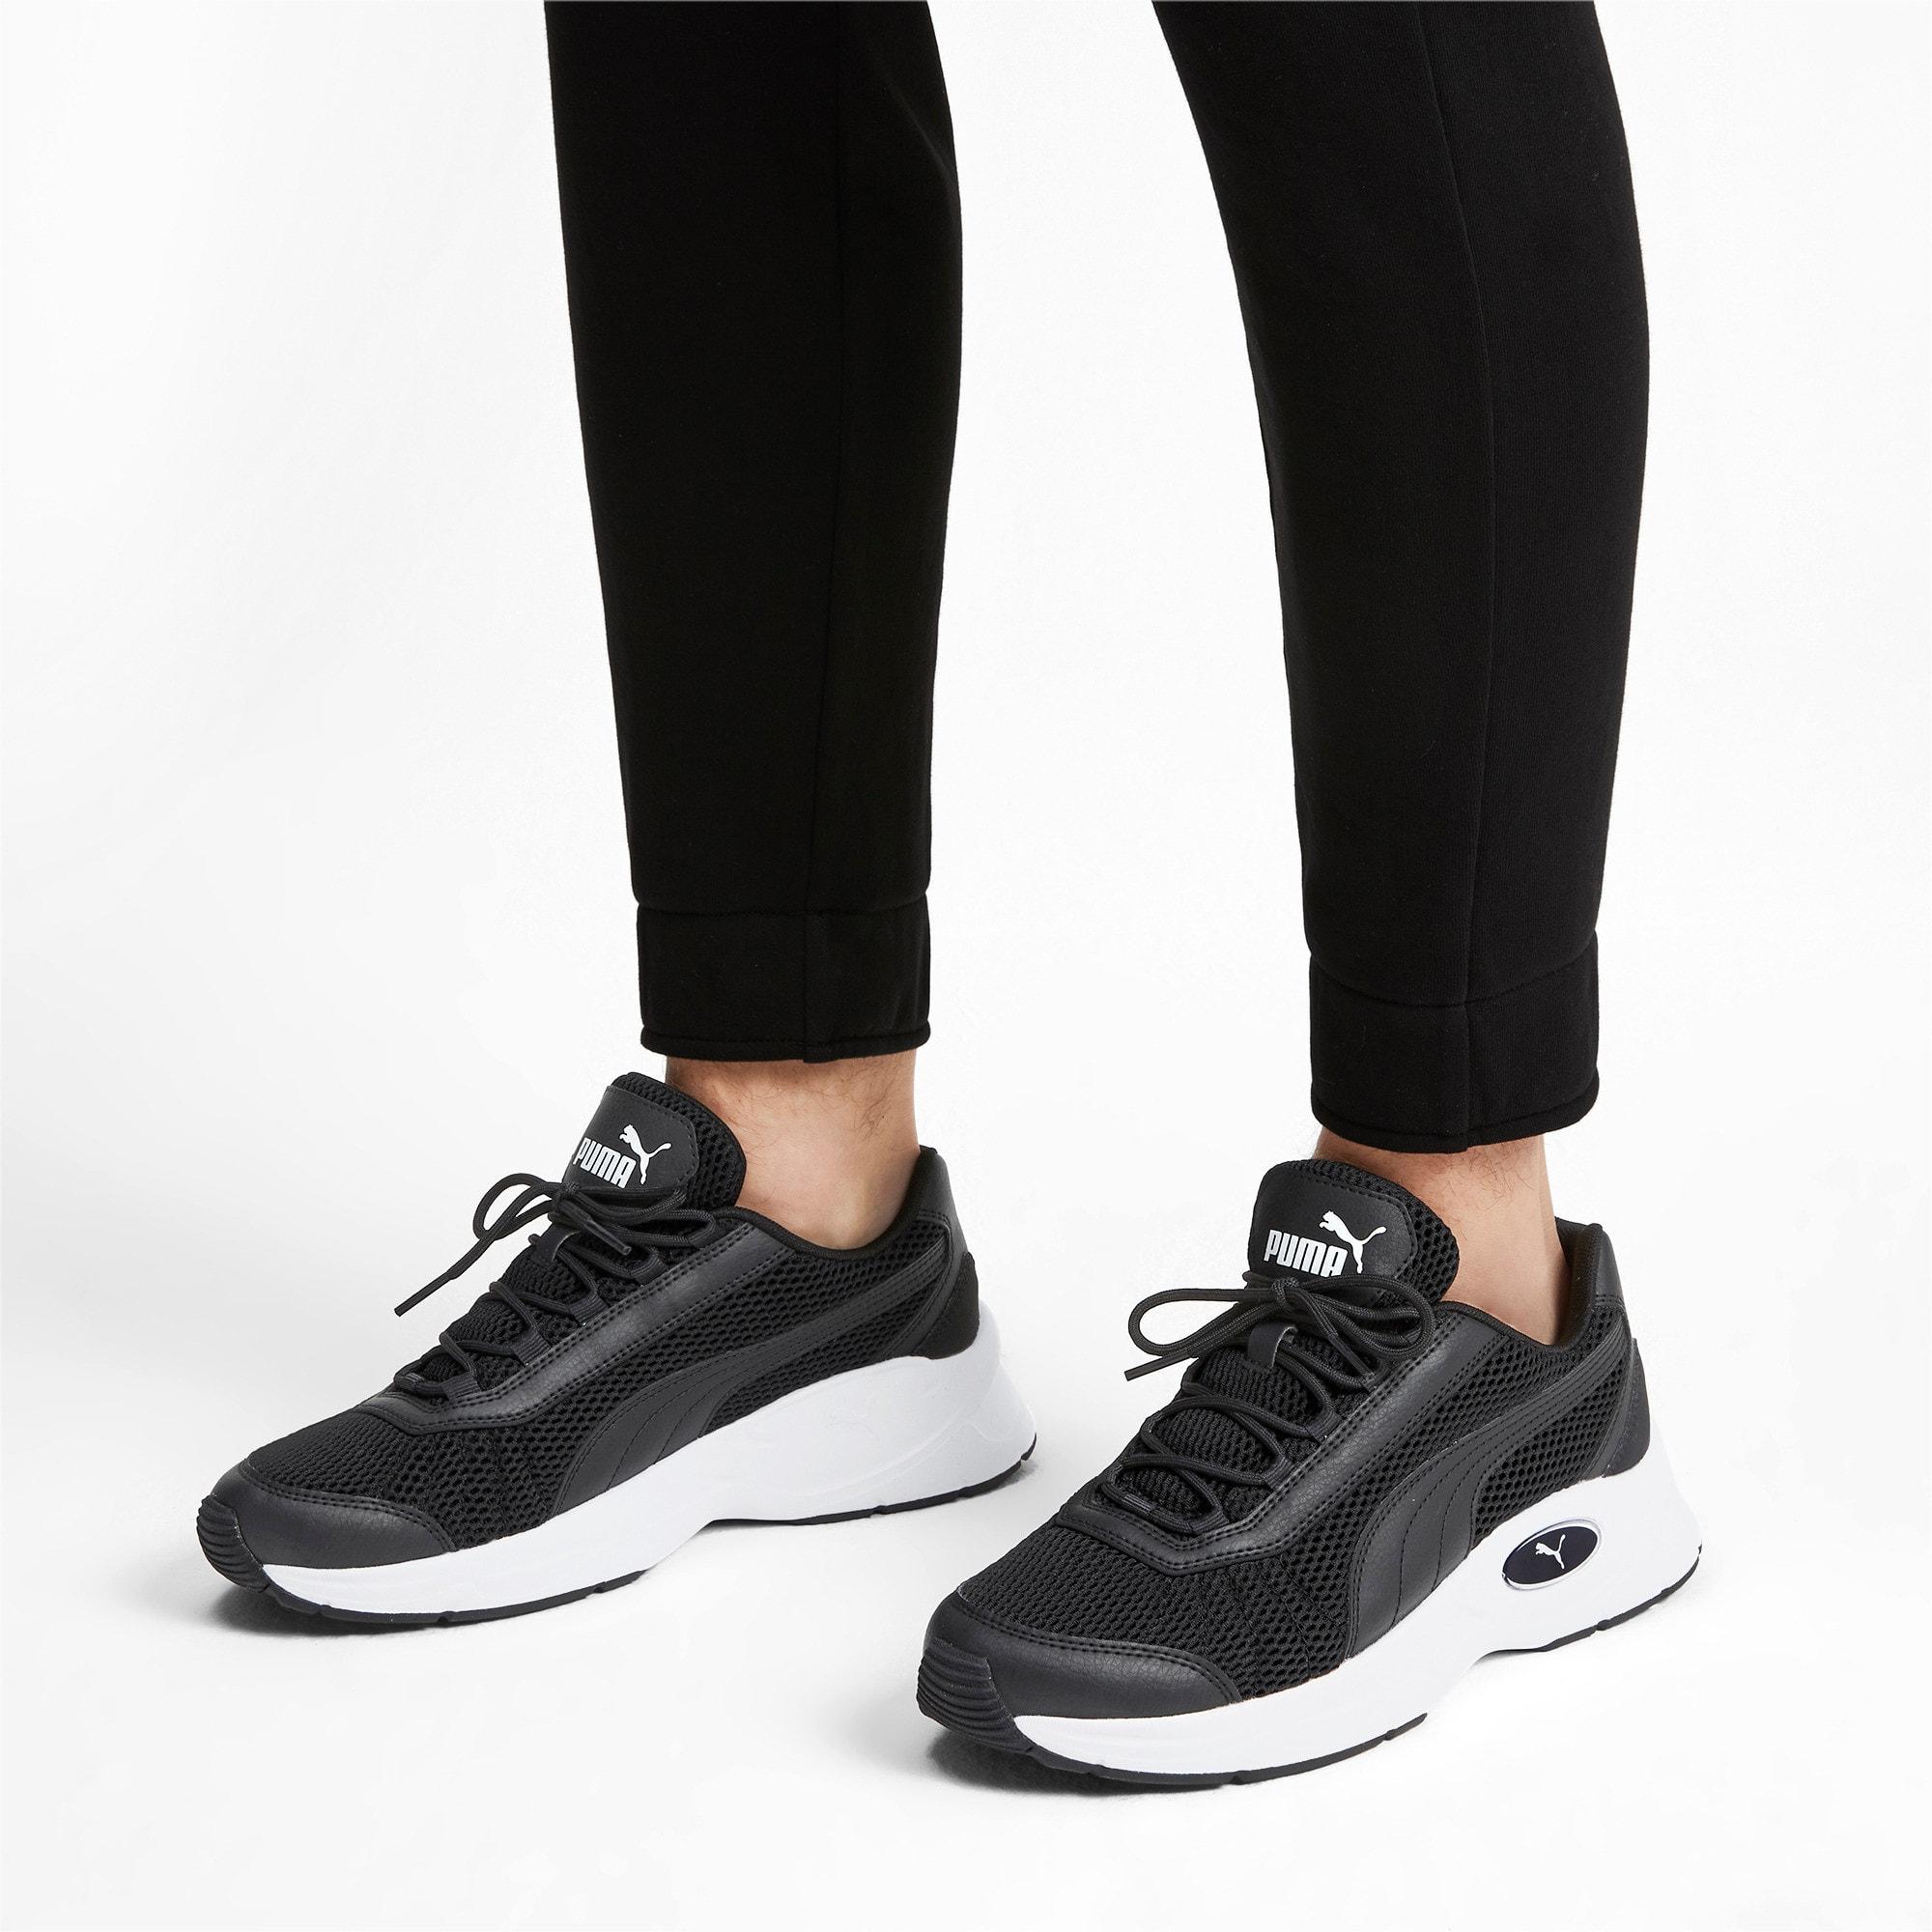 Thumbnail 2 of Nucleus Training Shoes, Puma Black-Puma Black, medium